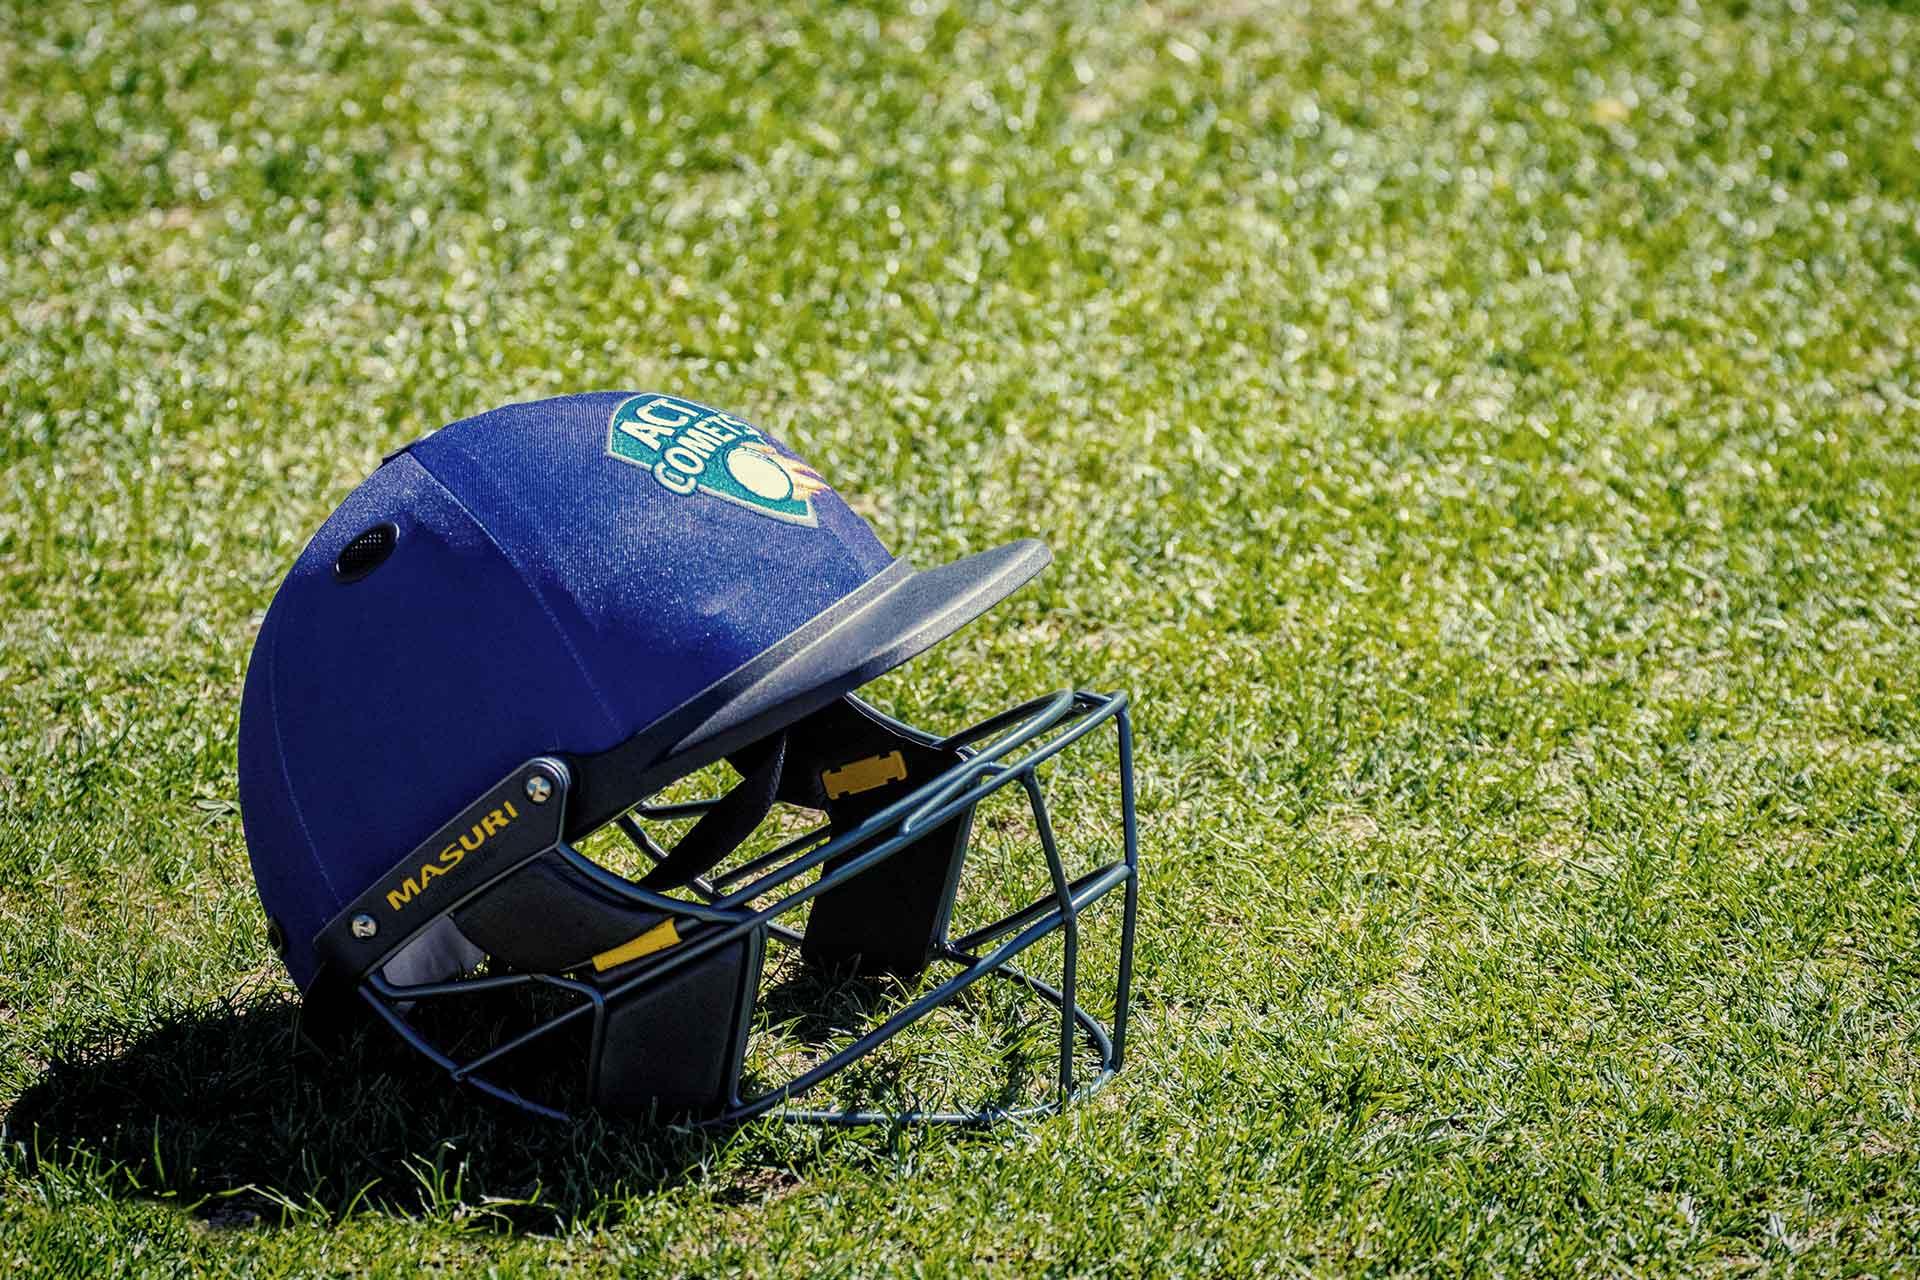 Blistering Blizzard Blasts Sydney T20 Bowling